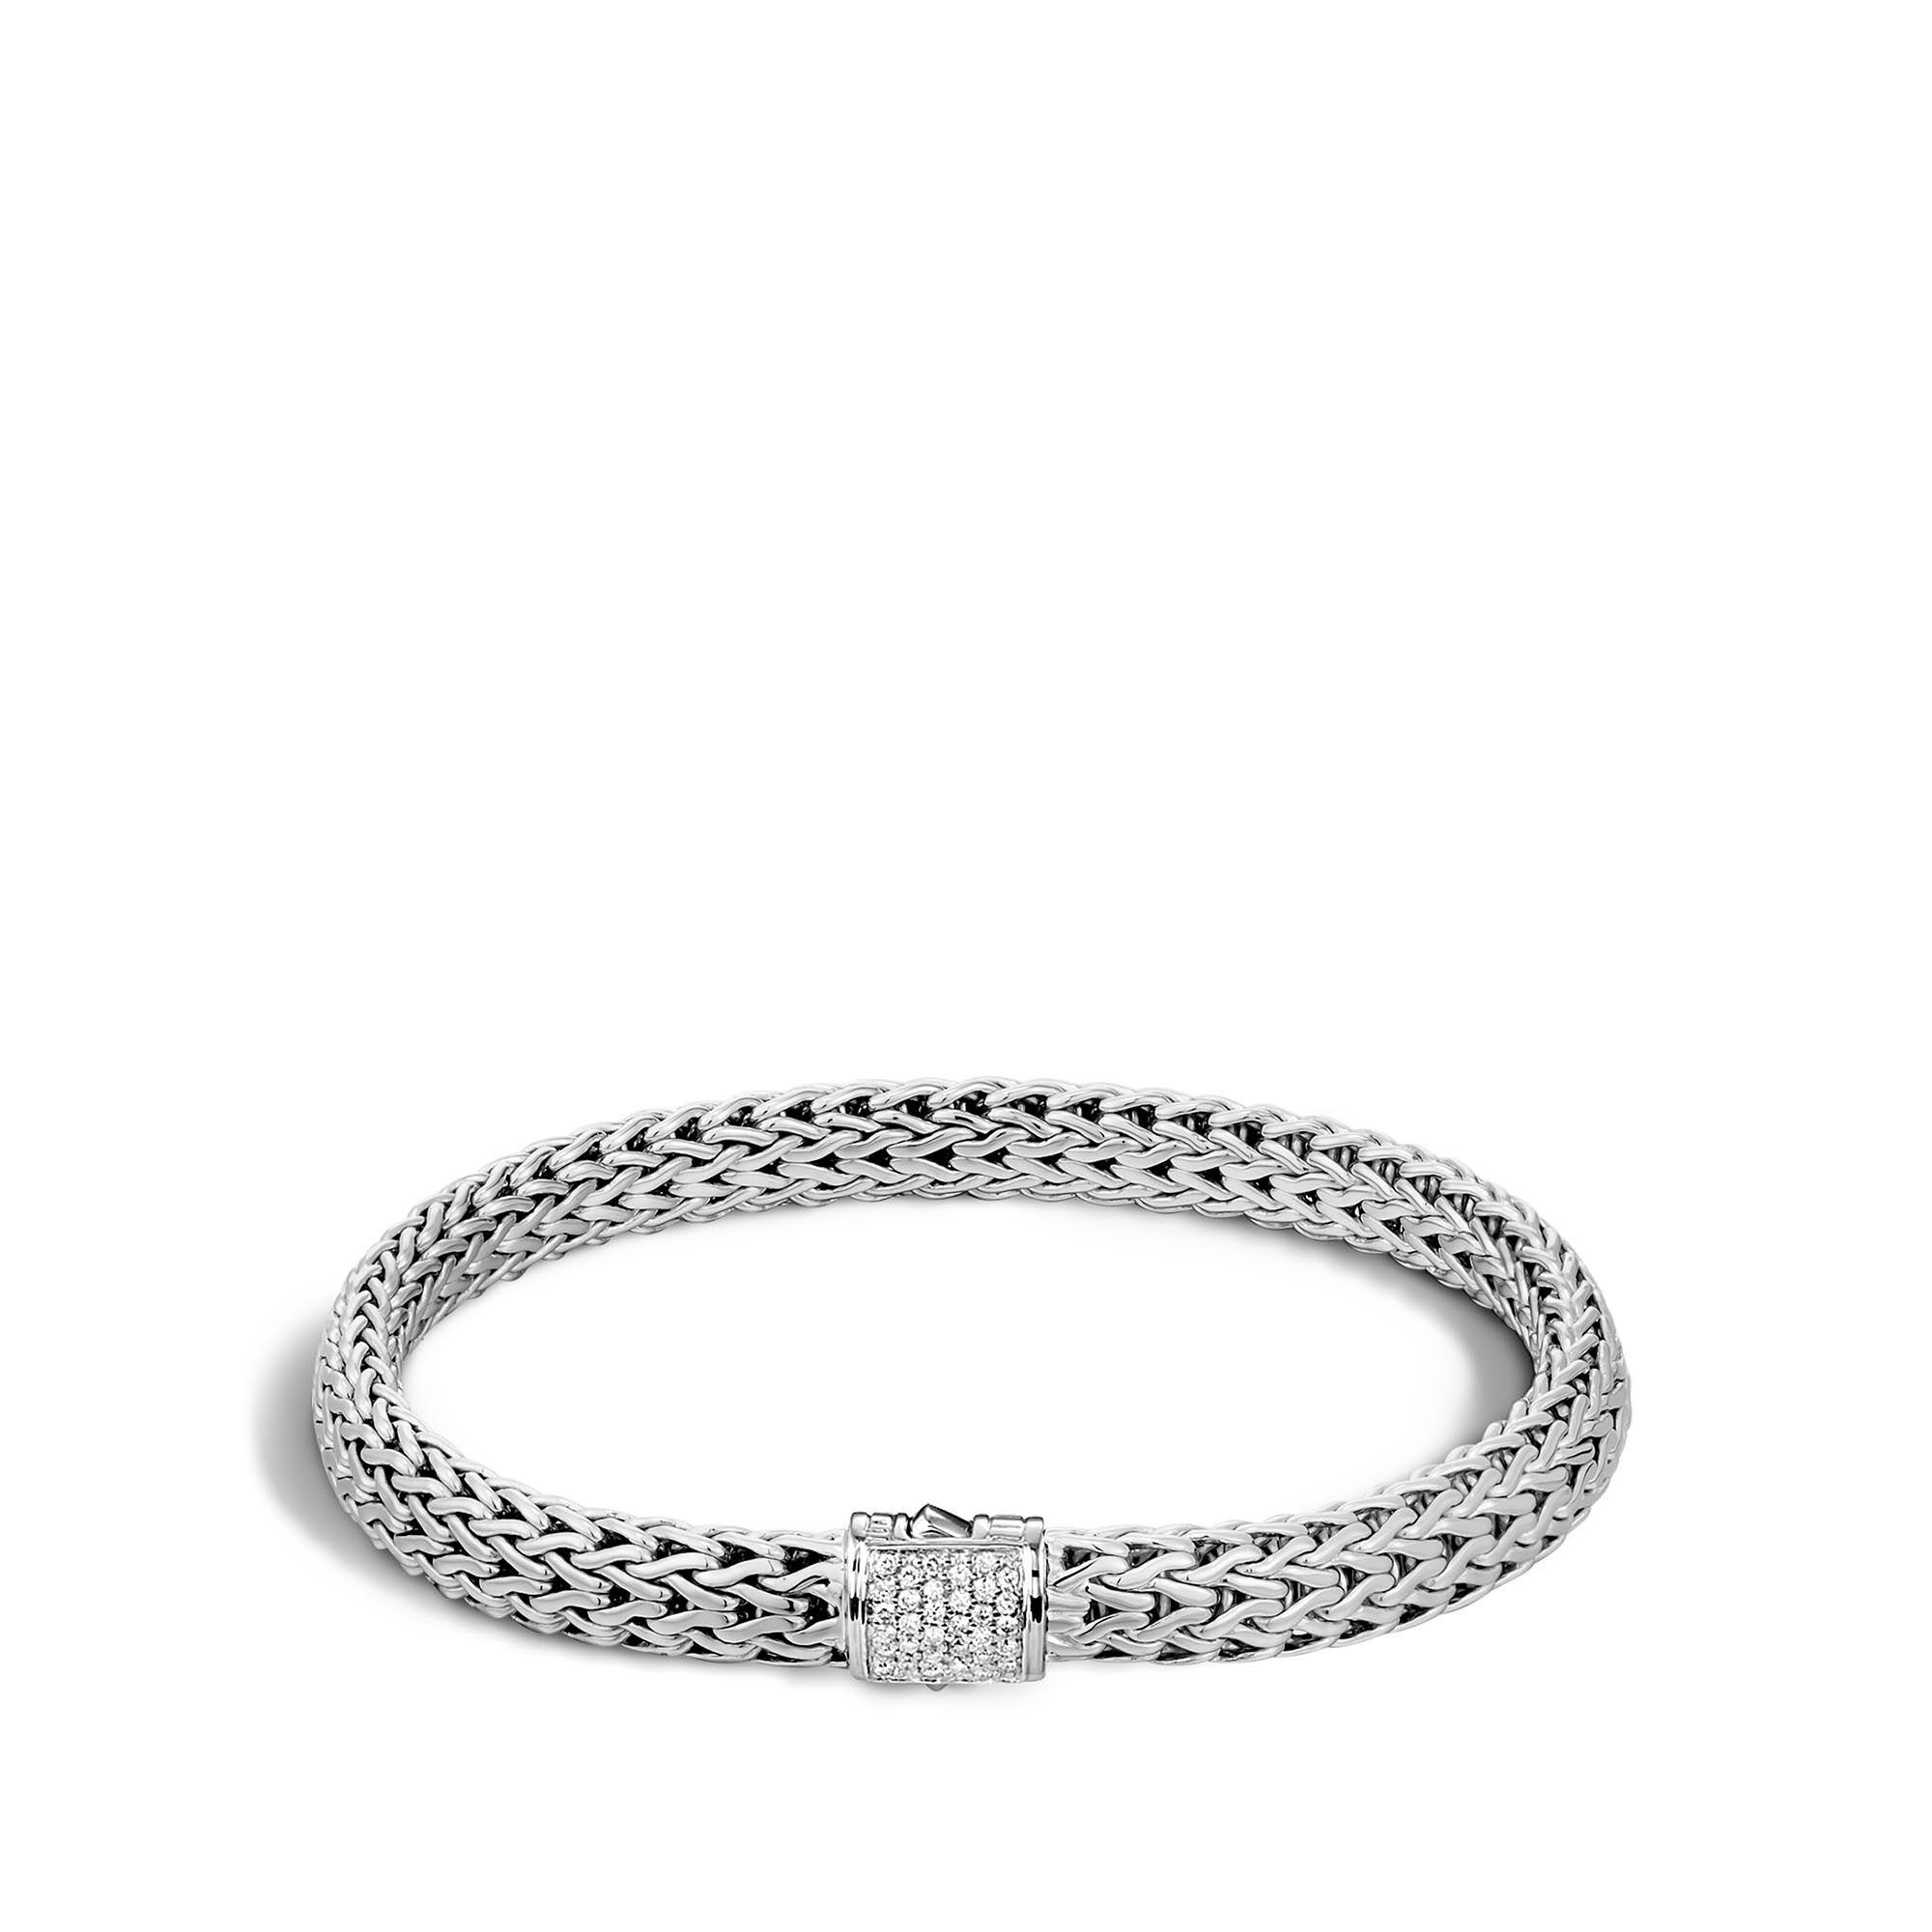 John Hardy Classic Chain Large Pave Diamond Coil Bracelet, Size M